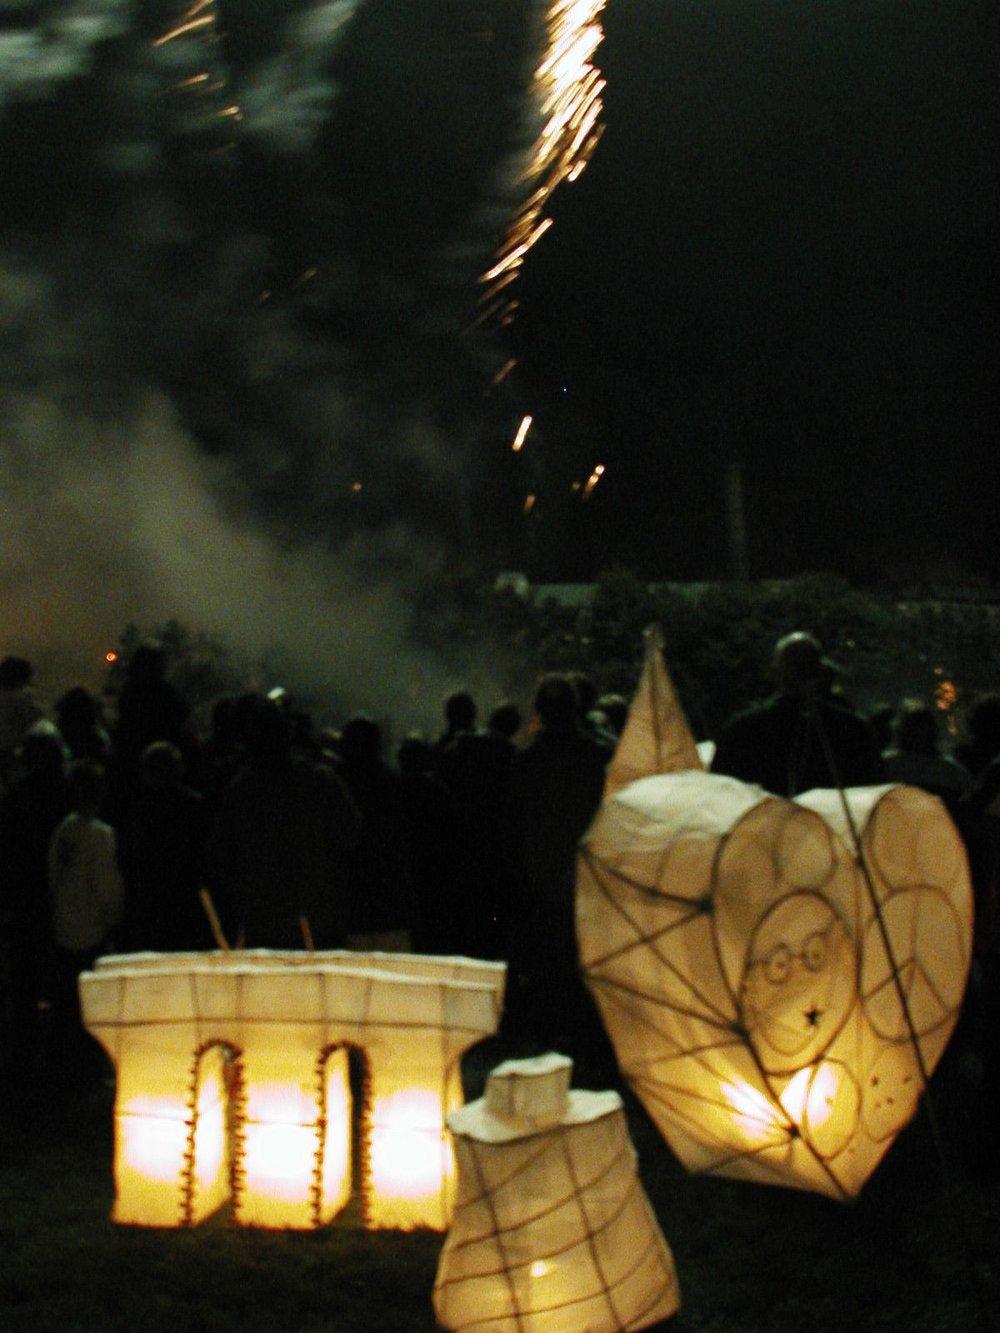 FestivalLanterns13.jpg